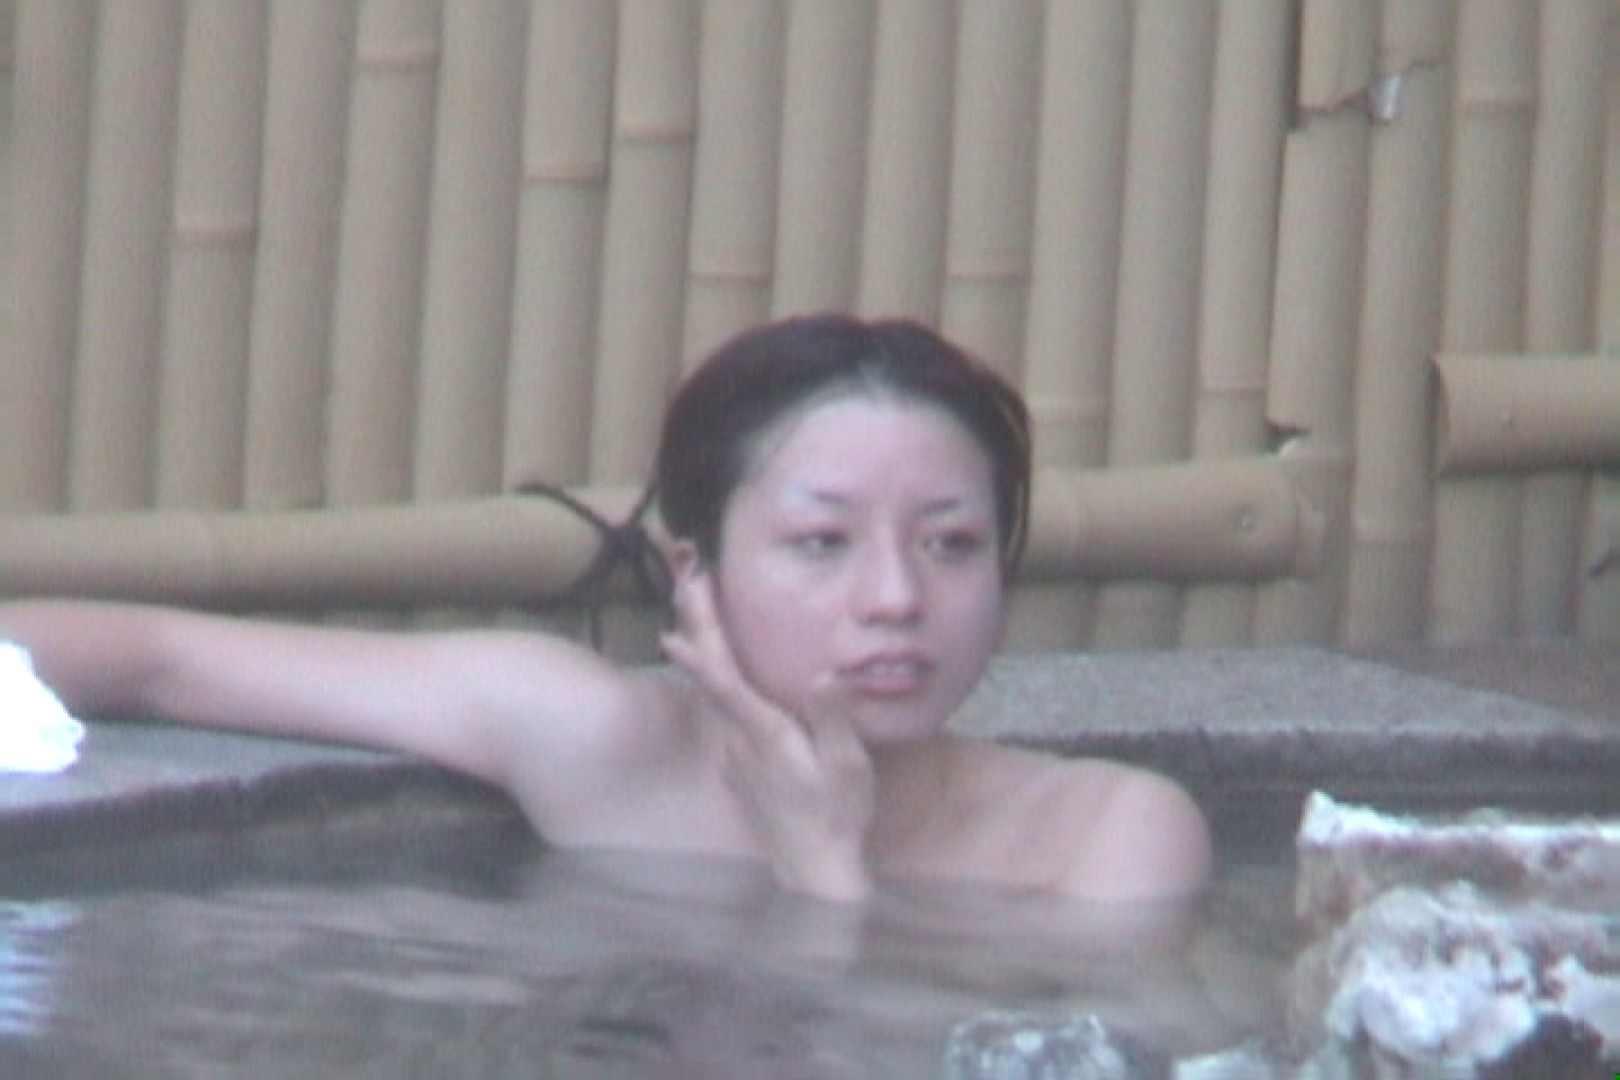 Aquaな露天風呂Vol.608 露天風呂突入 | 盗撮師作品  95pic 76